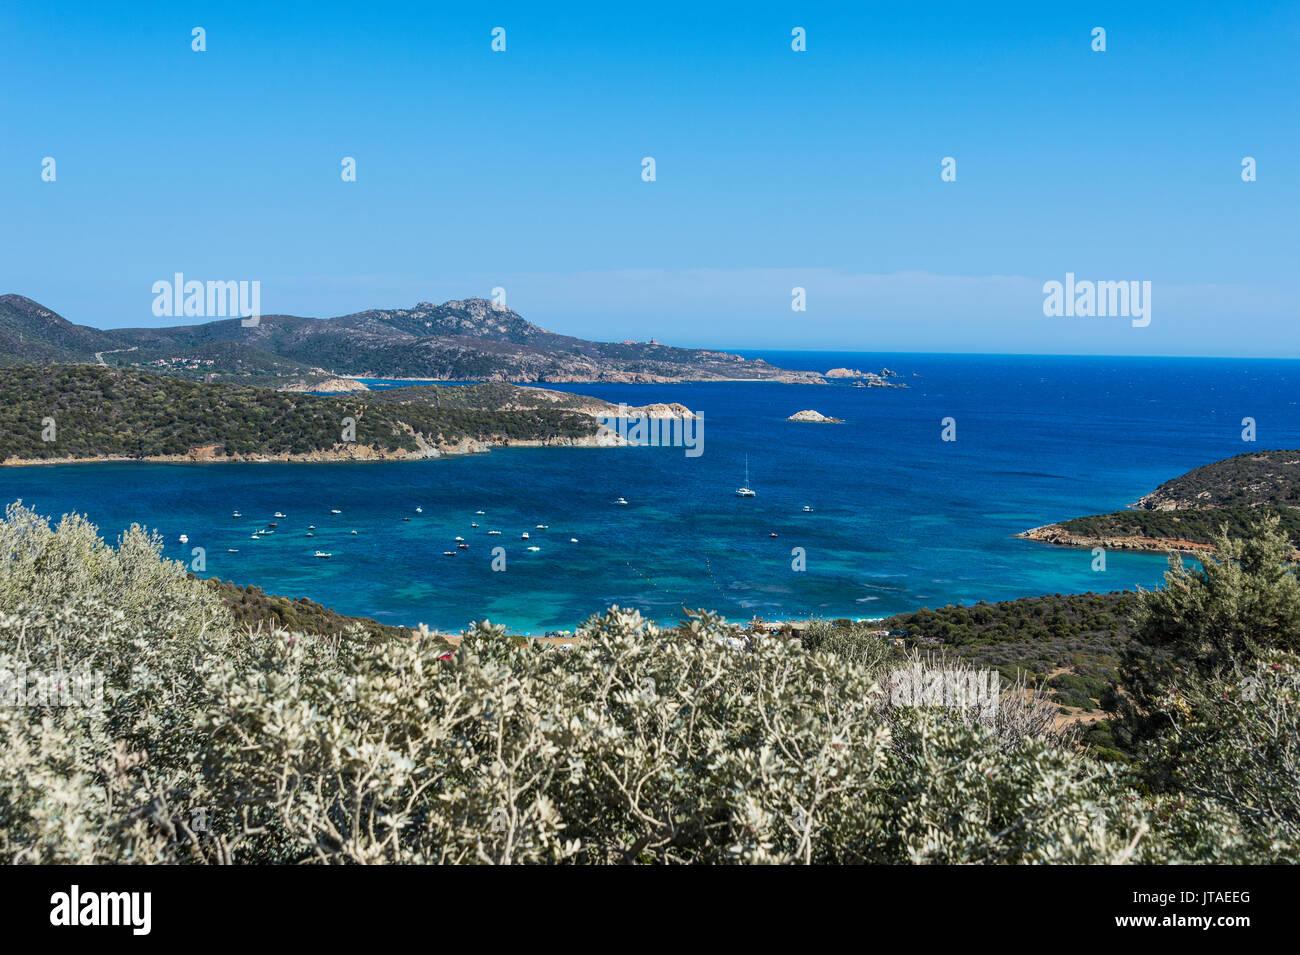 Belles Baies de la Costa del Sud, Sardaigne, Italie, Méditerranée, Europe Photo Stock